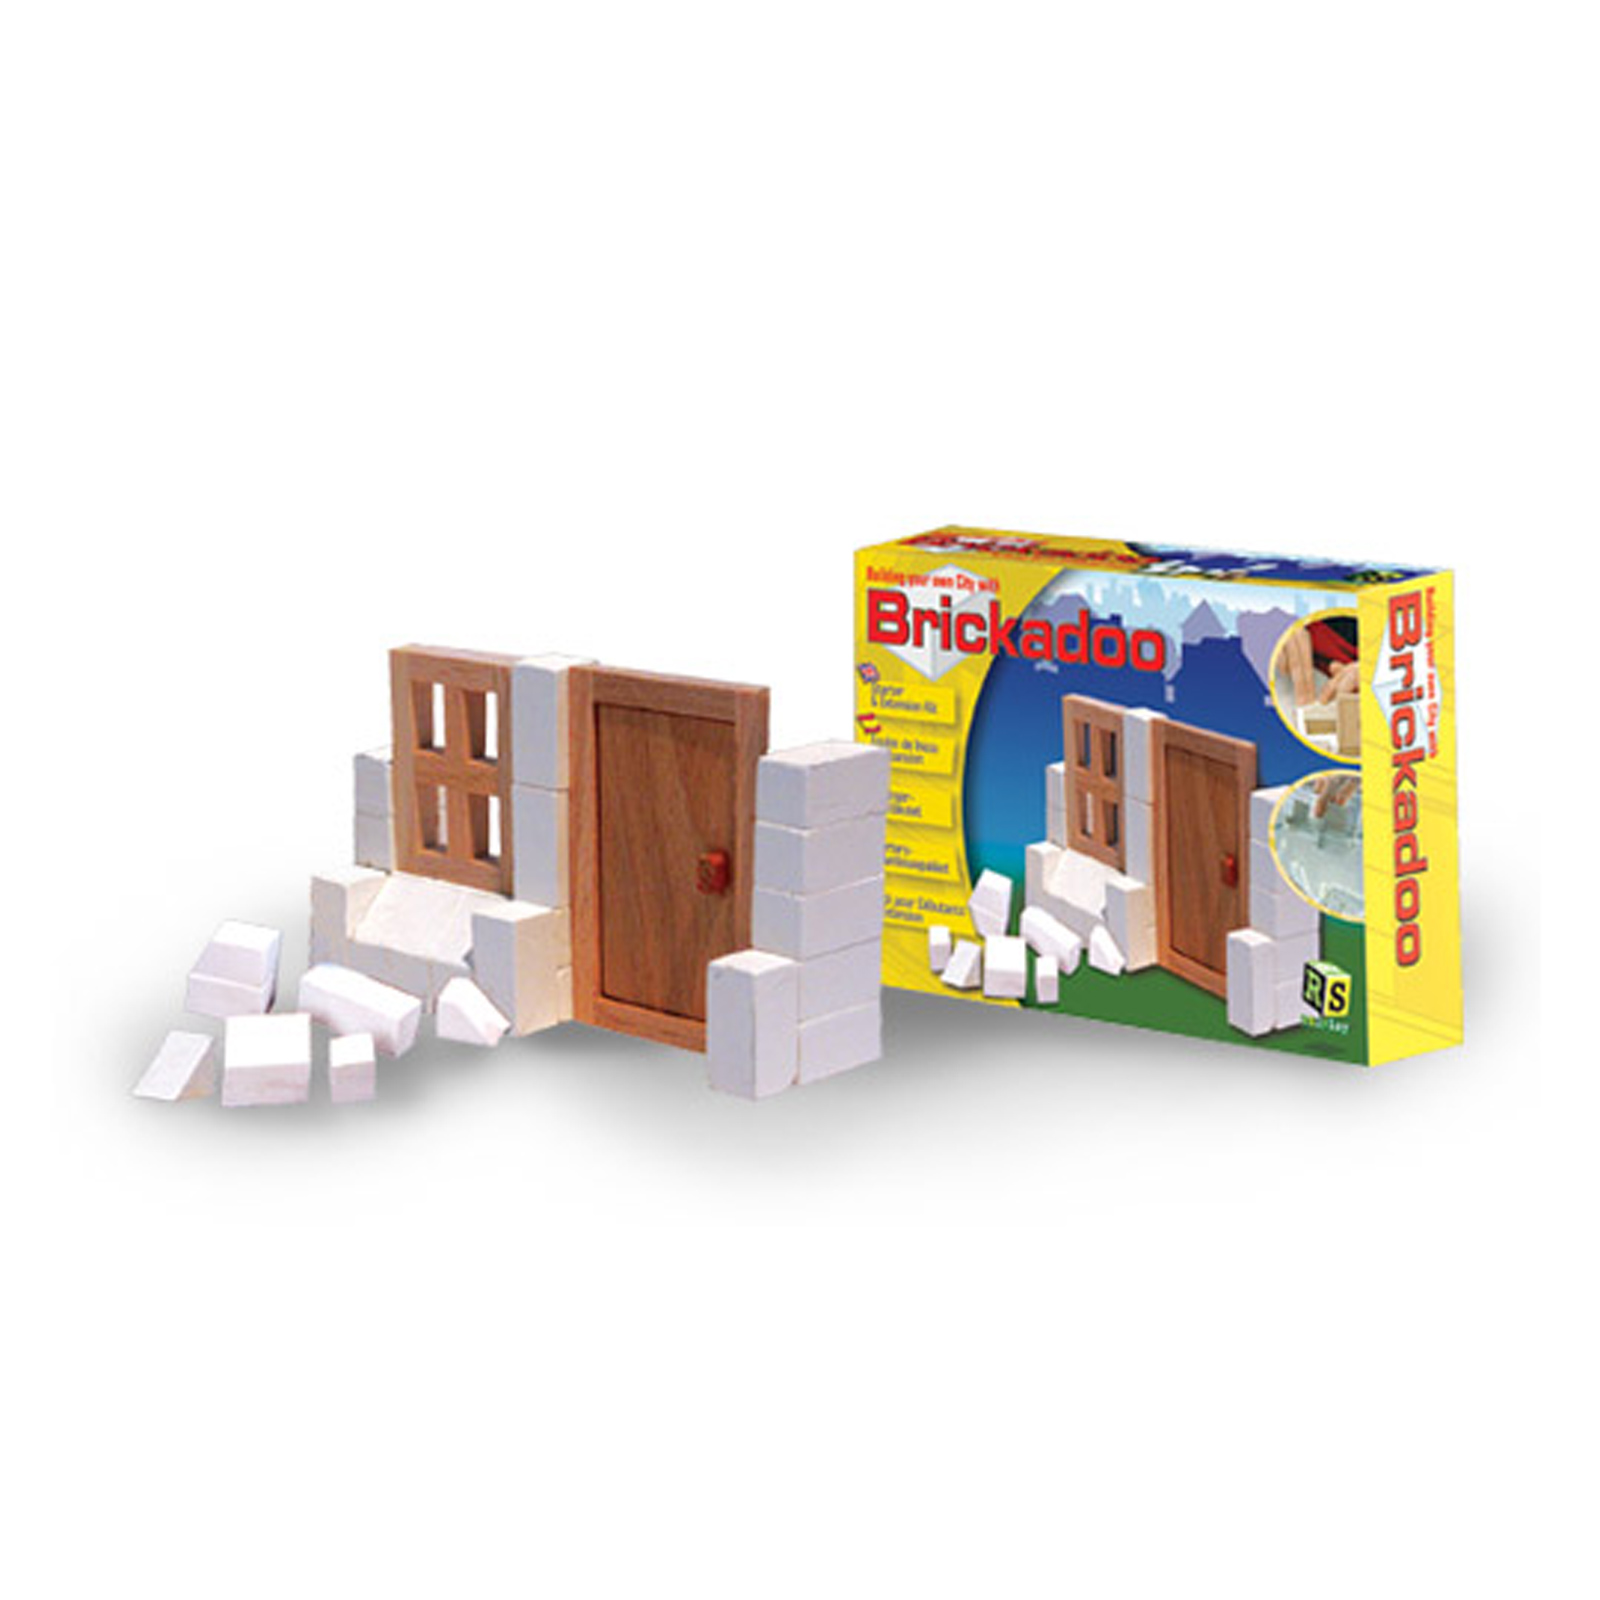 Construction Toys Sets : Construction toy building blocks set kids bricks kit